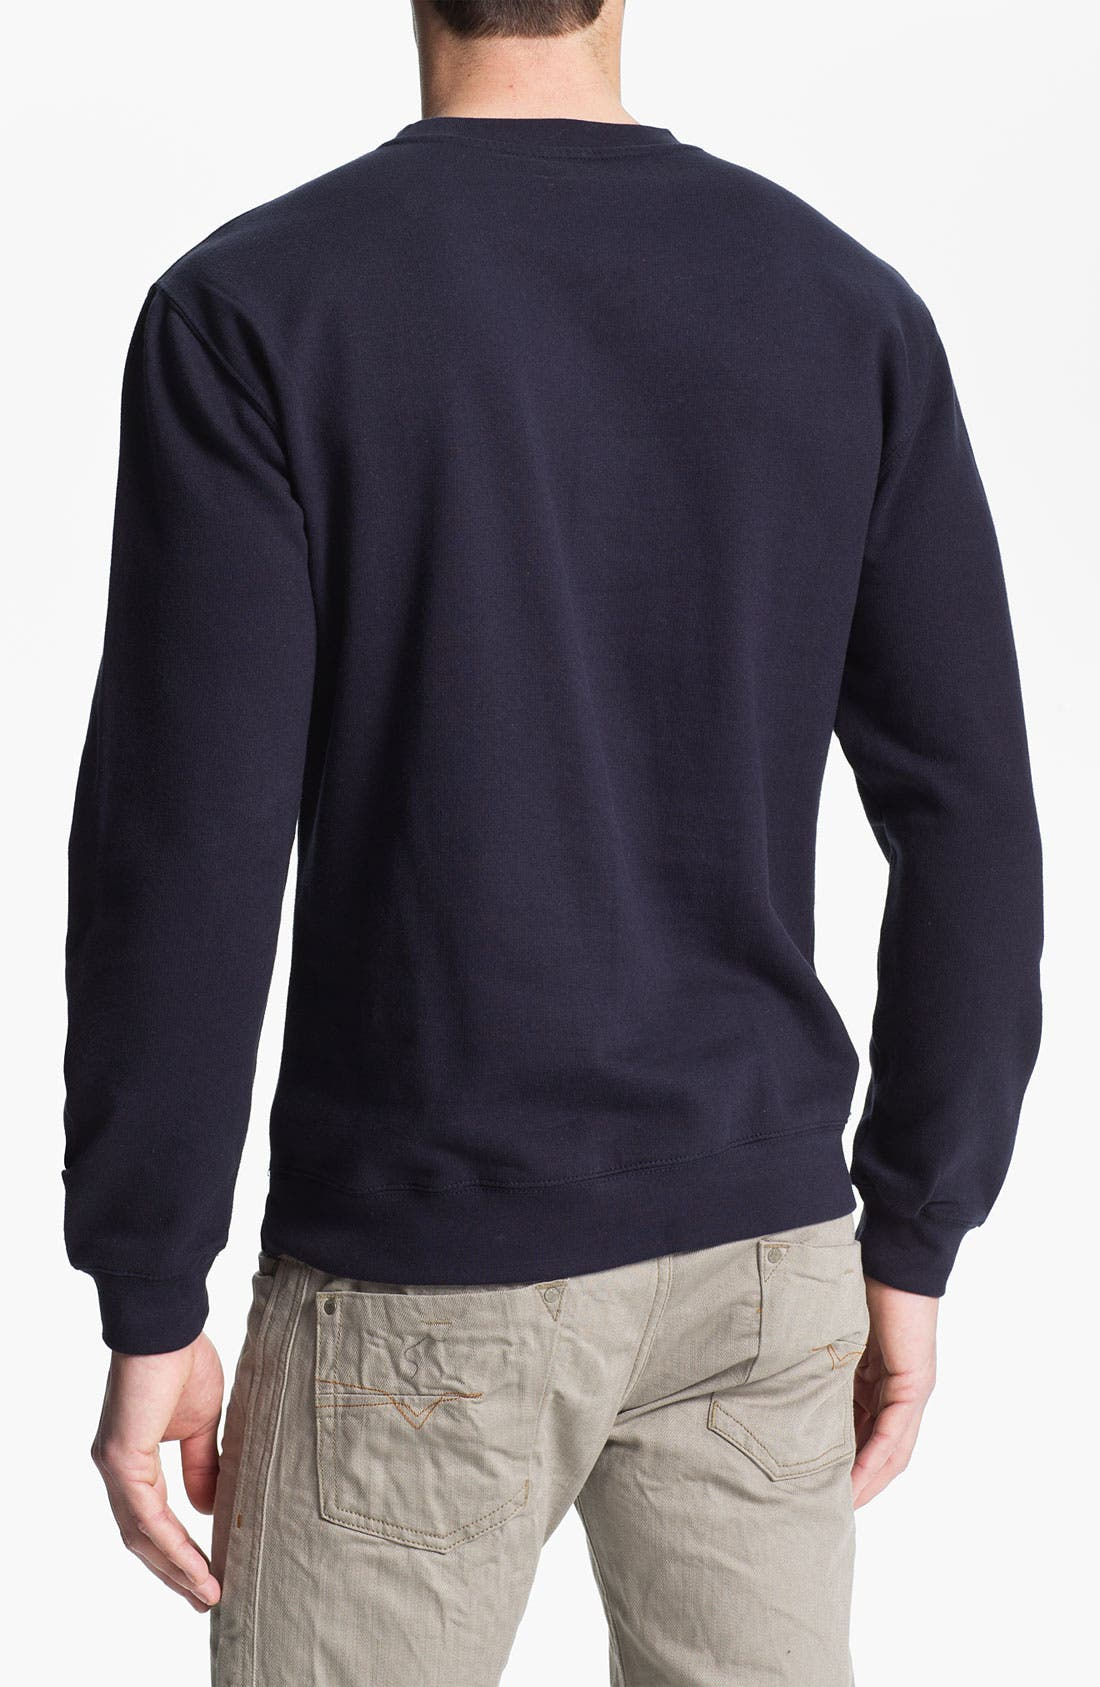 Alternate Image 2  - RVCA 'Korps' Graphic Crewneck Sweatshirt